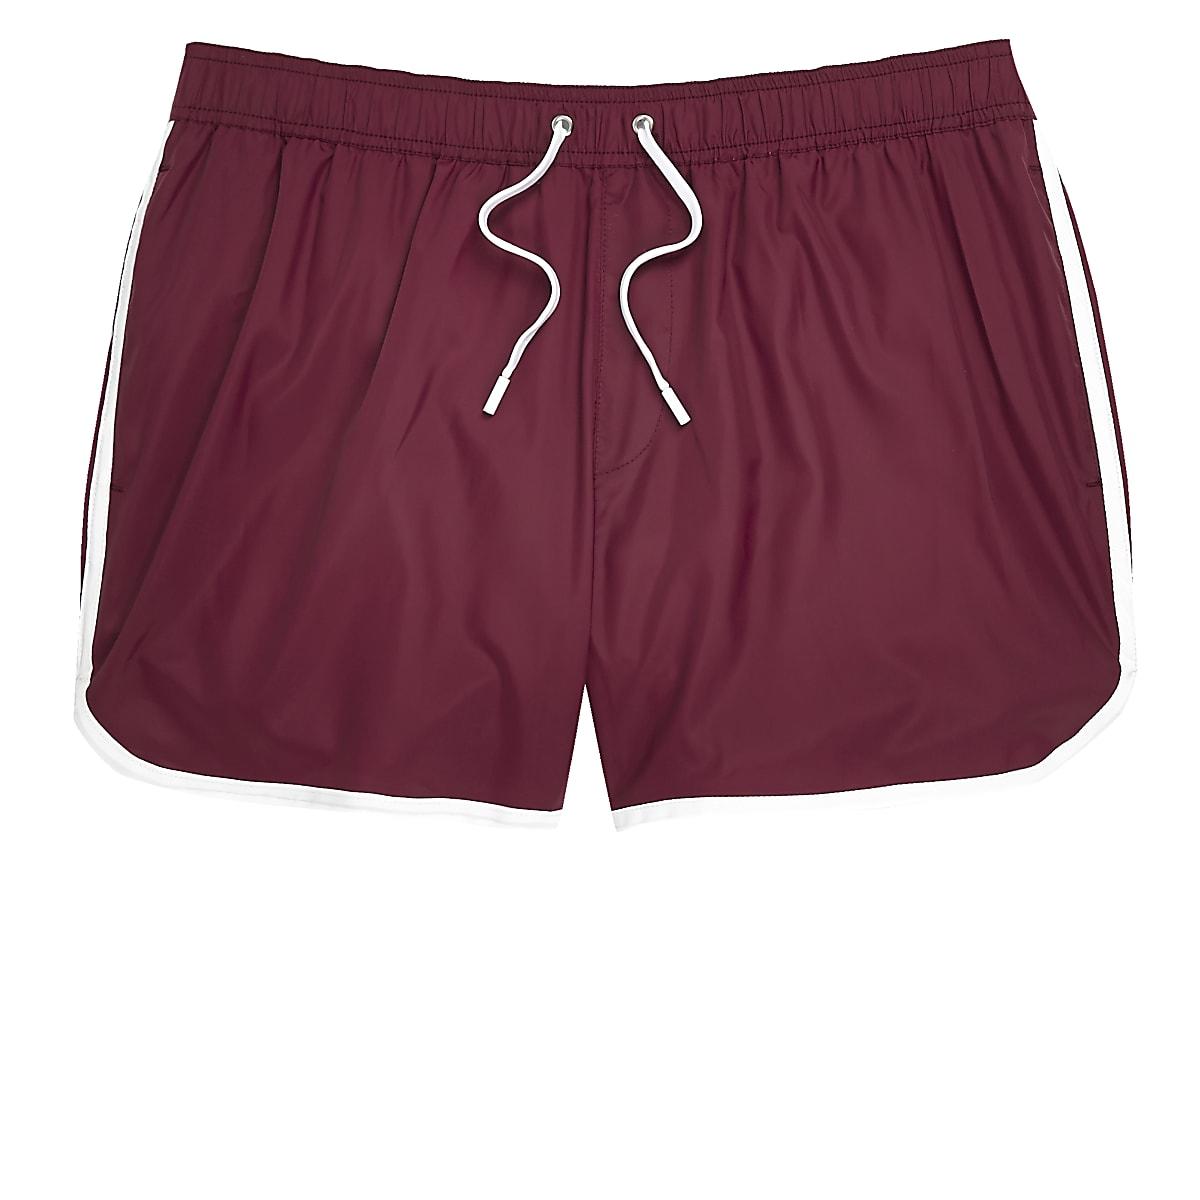 Dark red short swim shorts